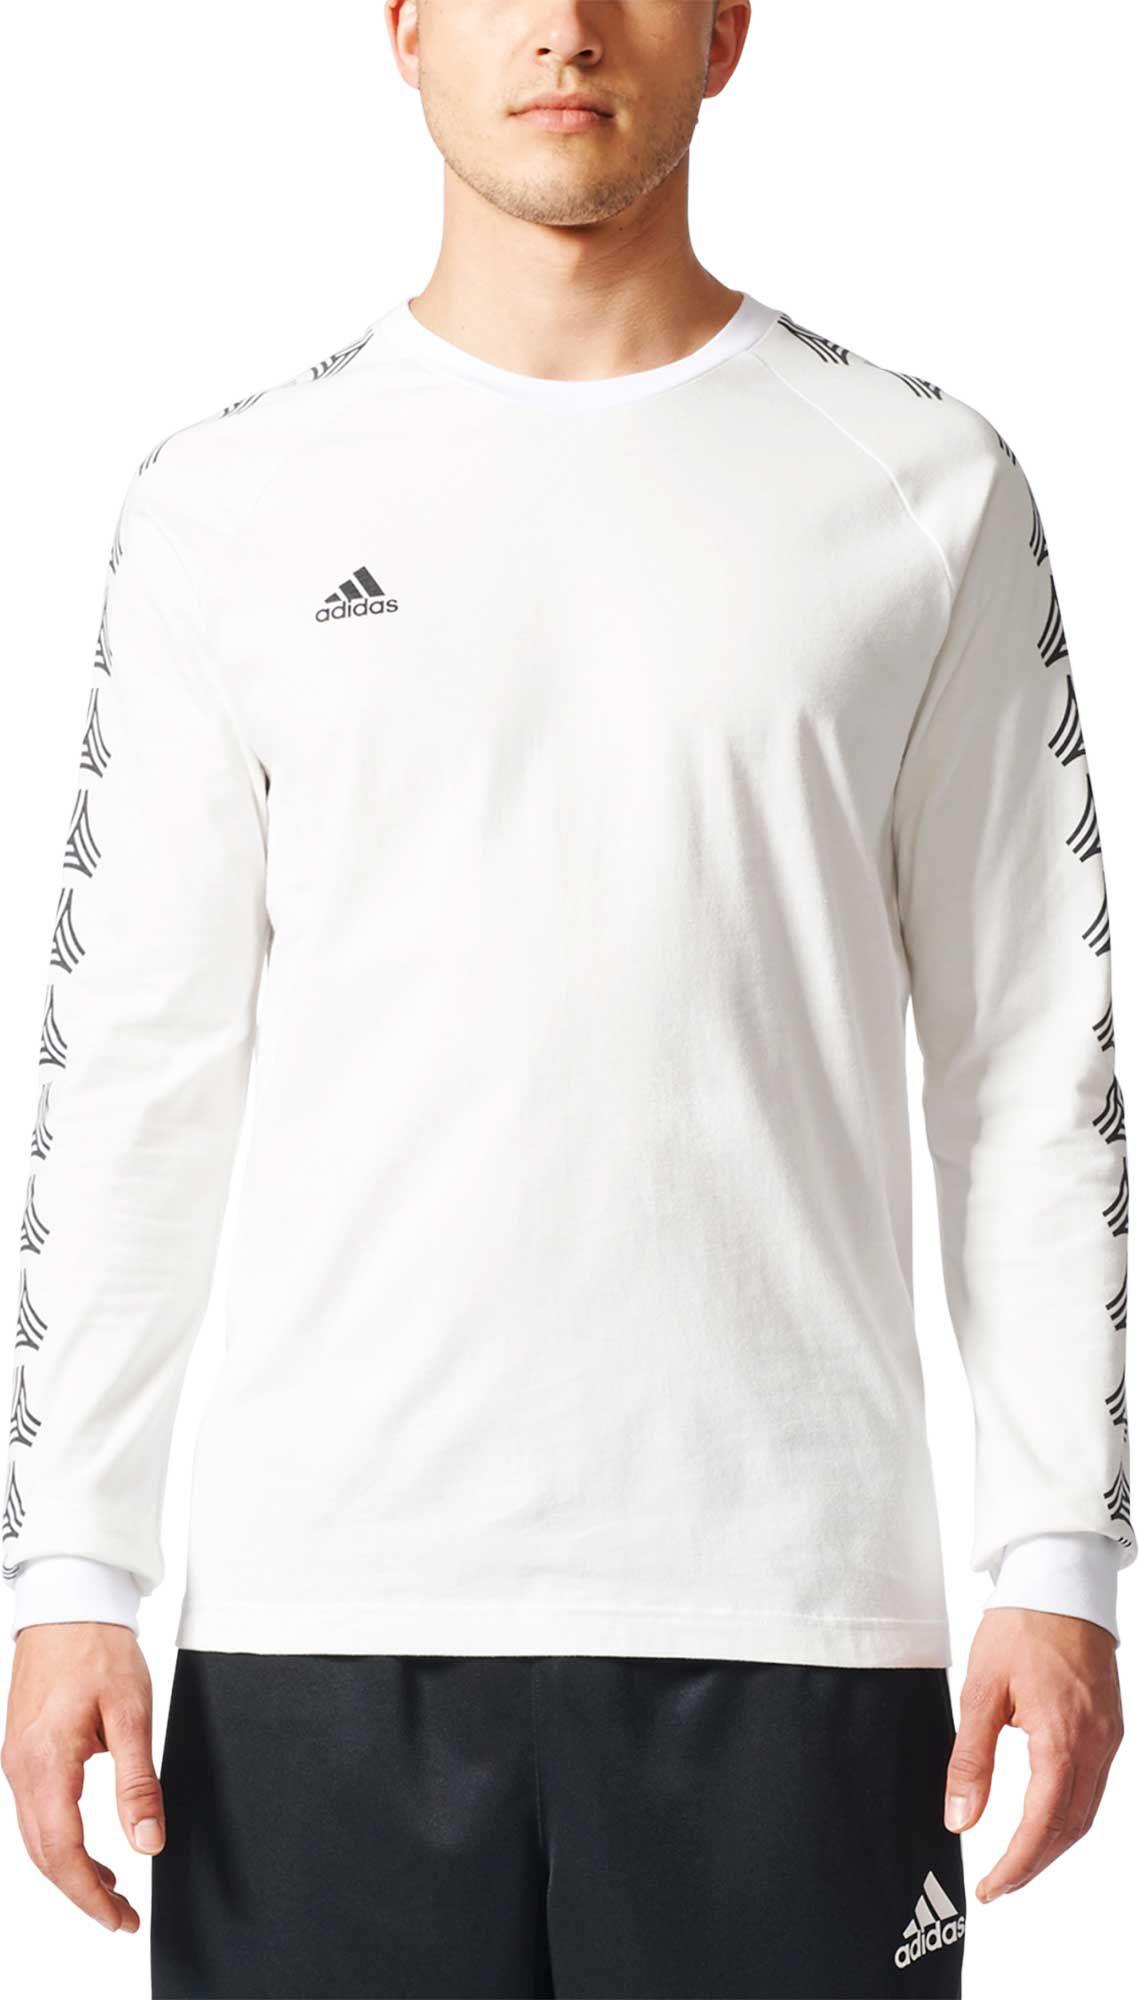 adidas long sleeve. adidas men\u0027s tango cage long sleeve t-shirt